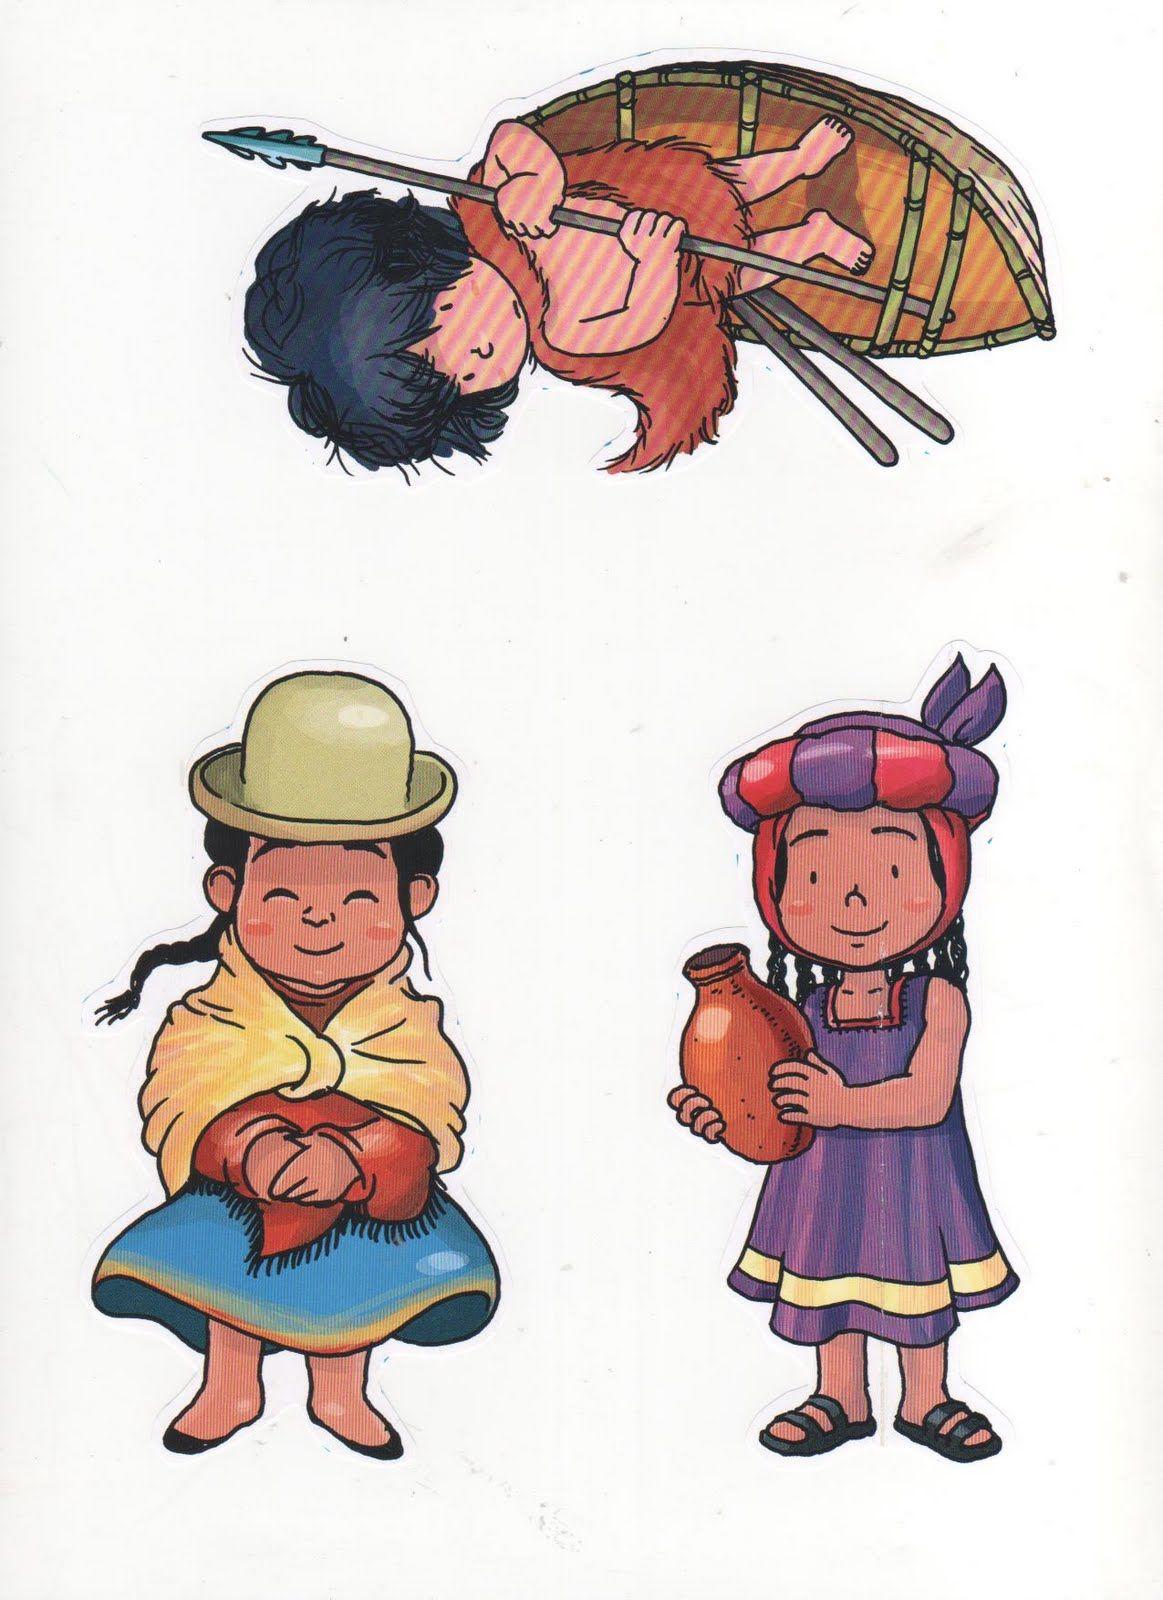 Pin de CLAUDIA JARA en Isabela cueca  Pinterest  Chile Bailes